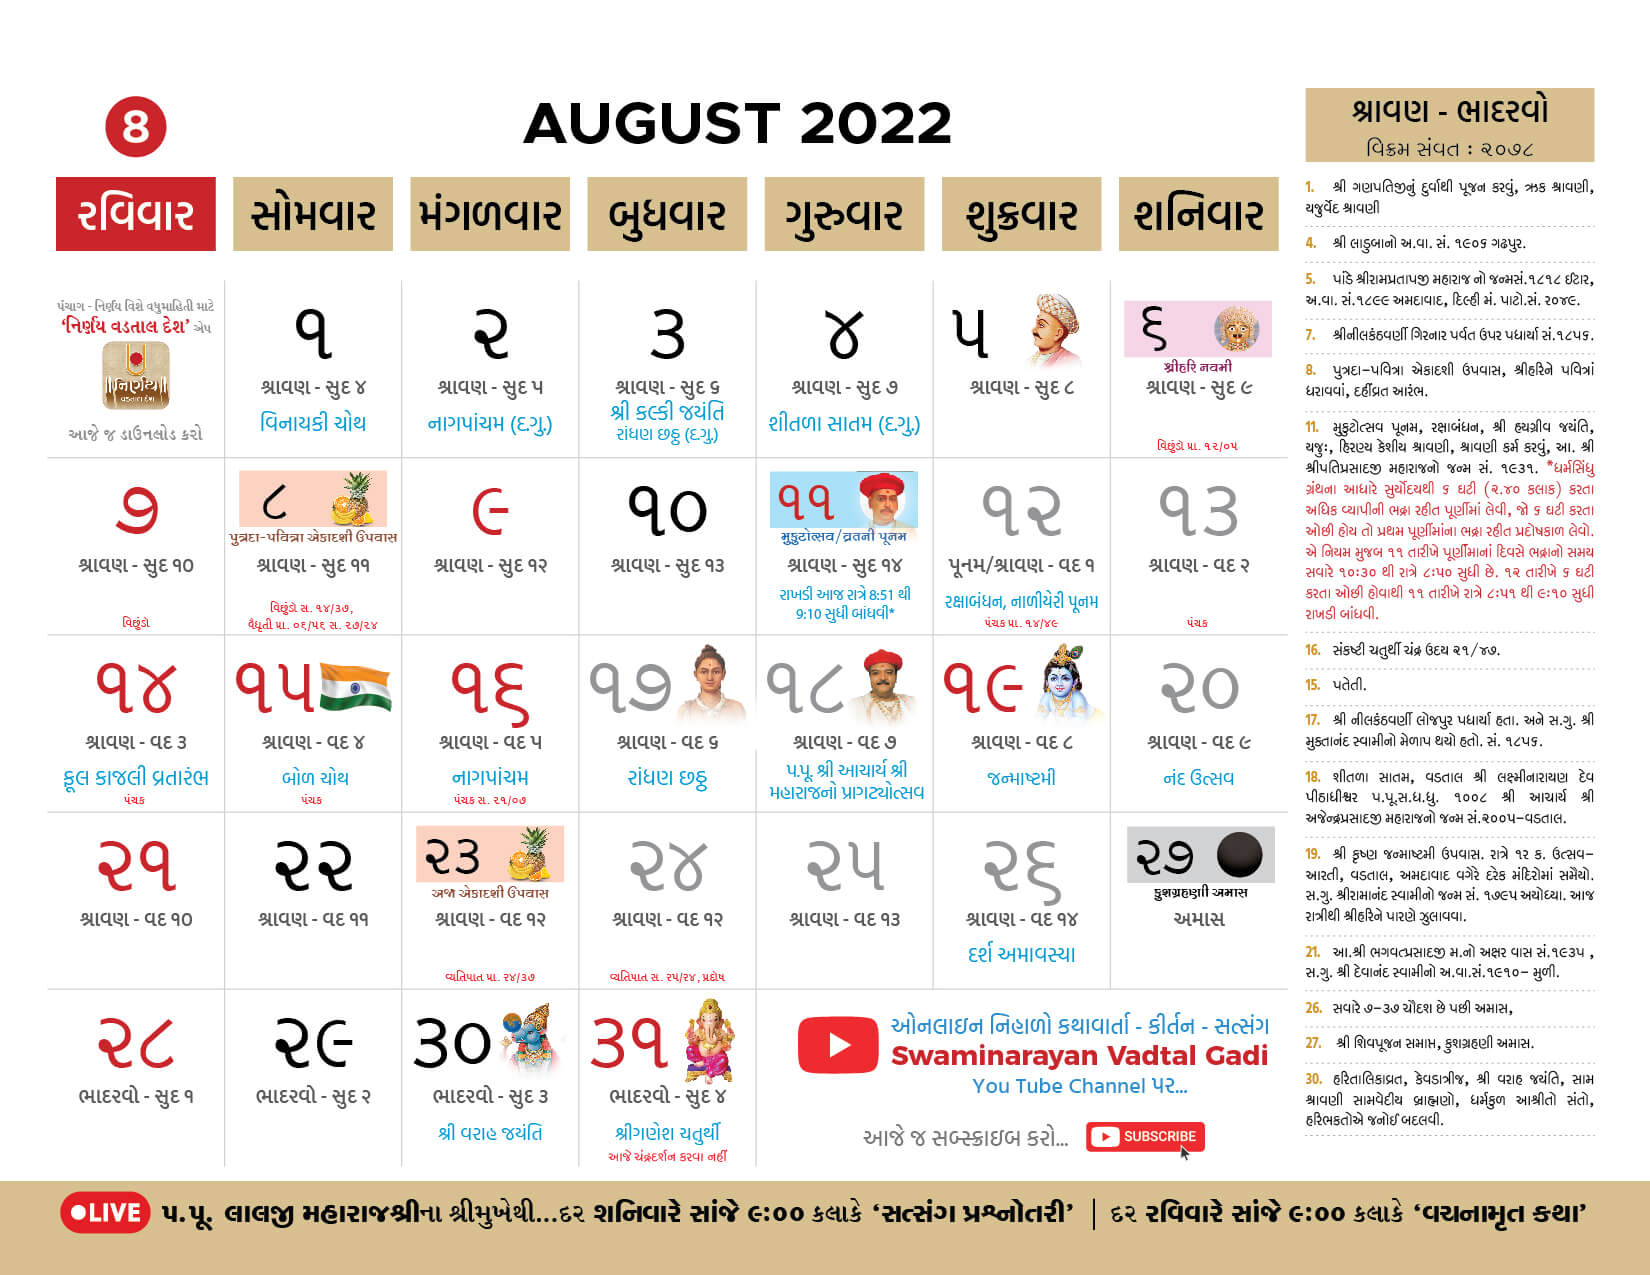 Aug 2022